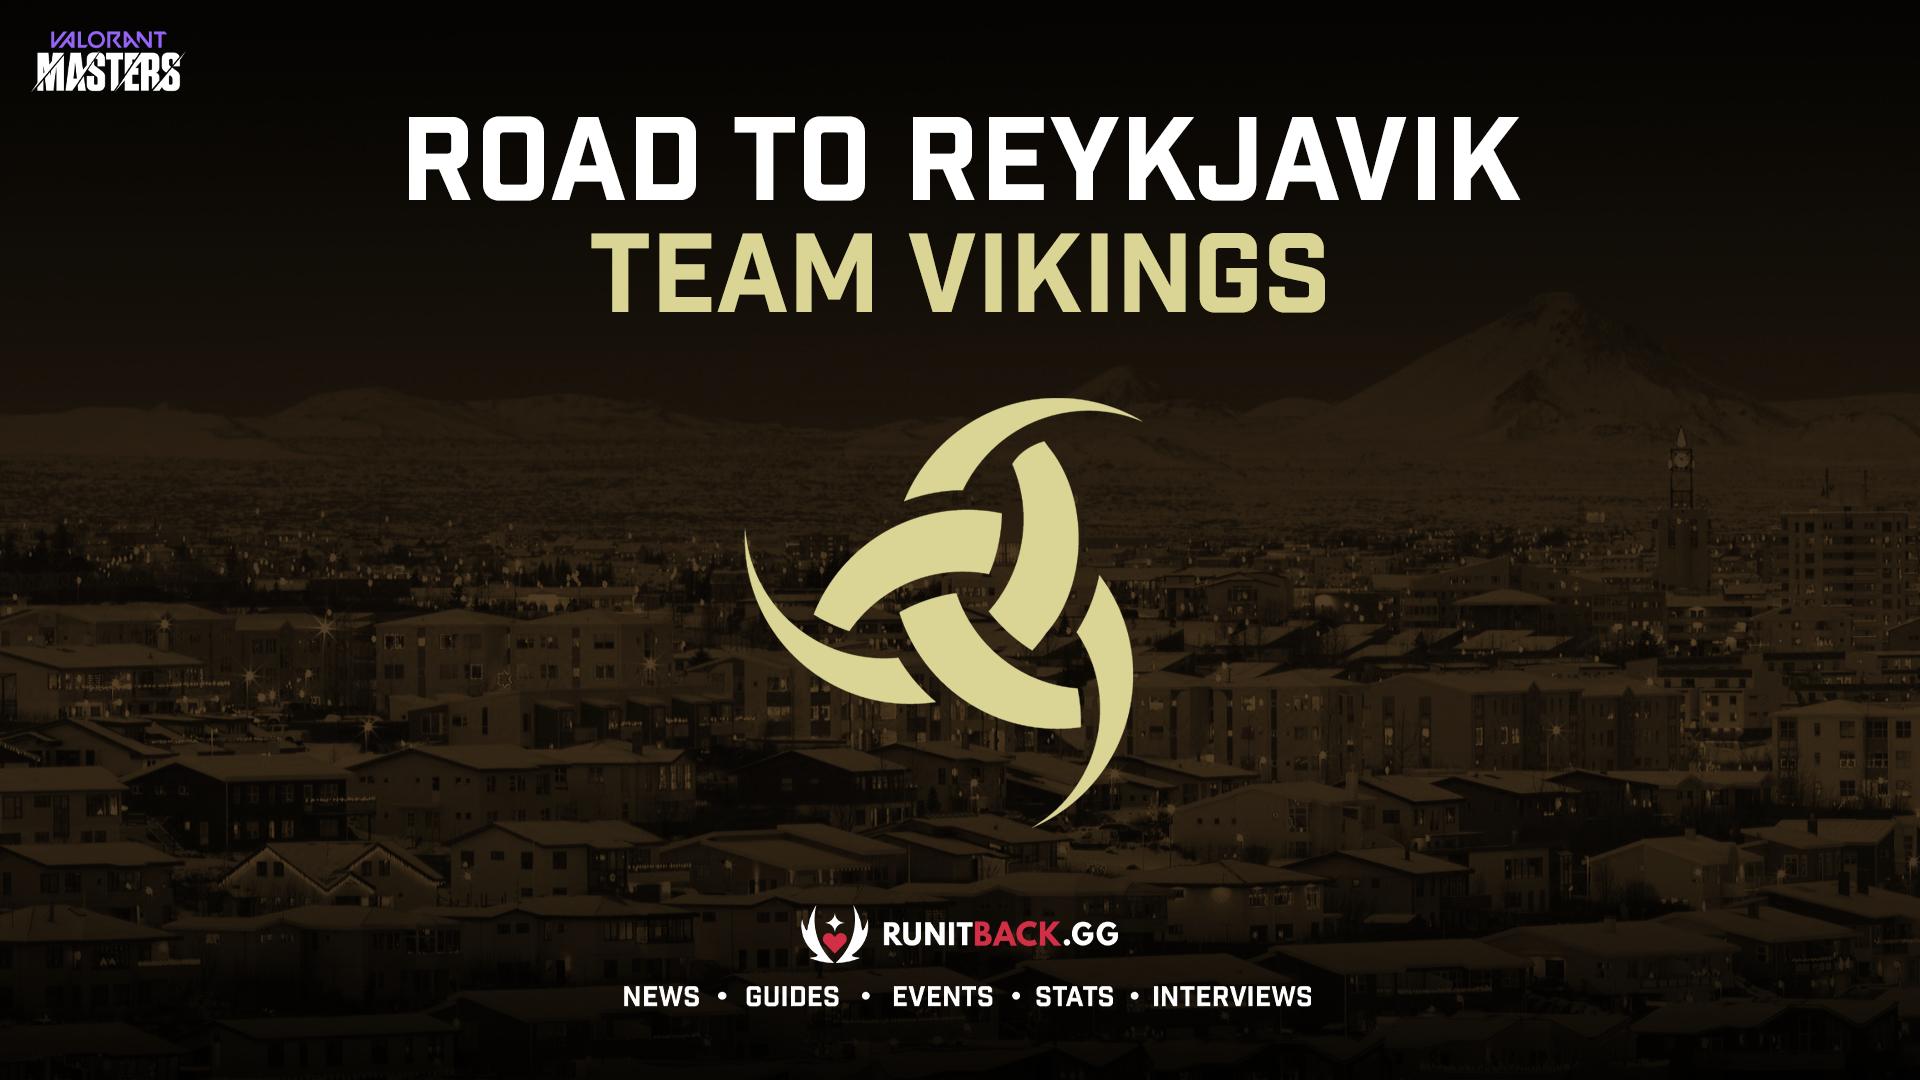 team vikings